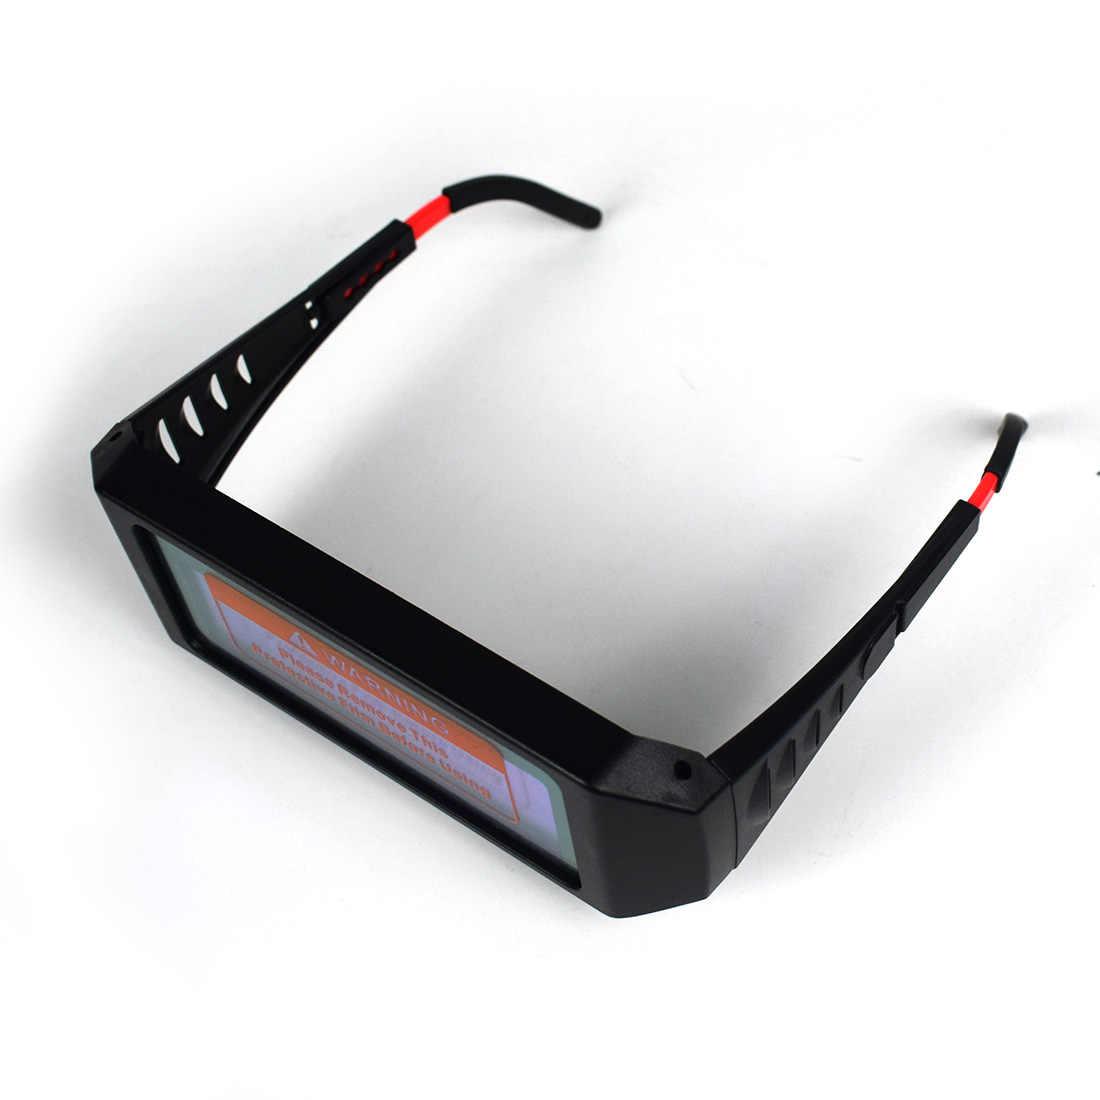 6dd472f9 ... 1 Pair Solar Auto Darkening Welding Goggle, Safety Protective Welding  Glasses Mask Helmet, Eyes ...